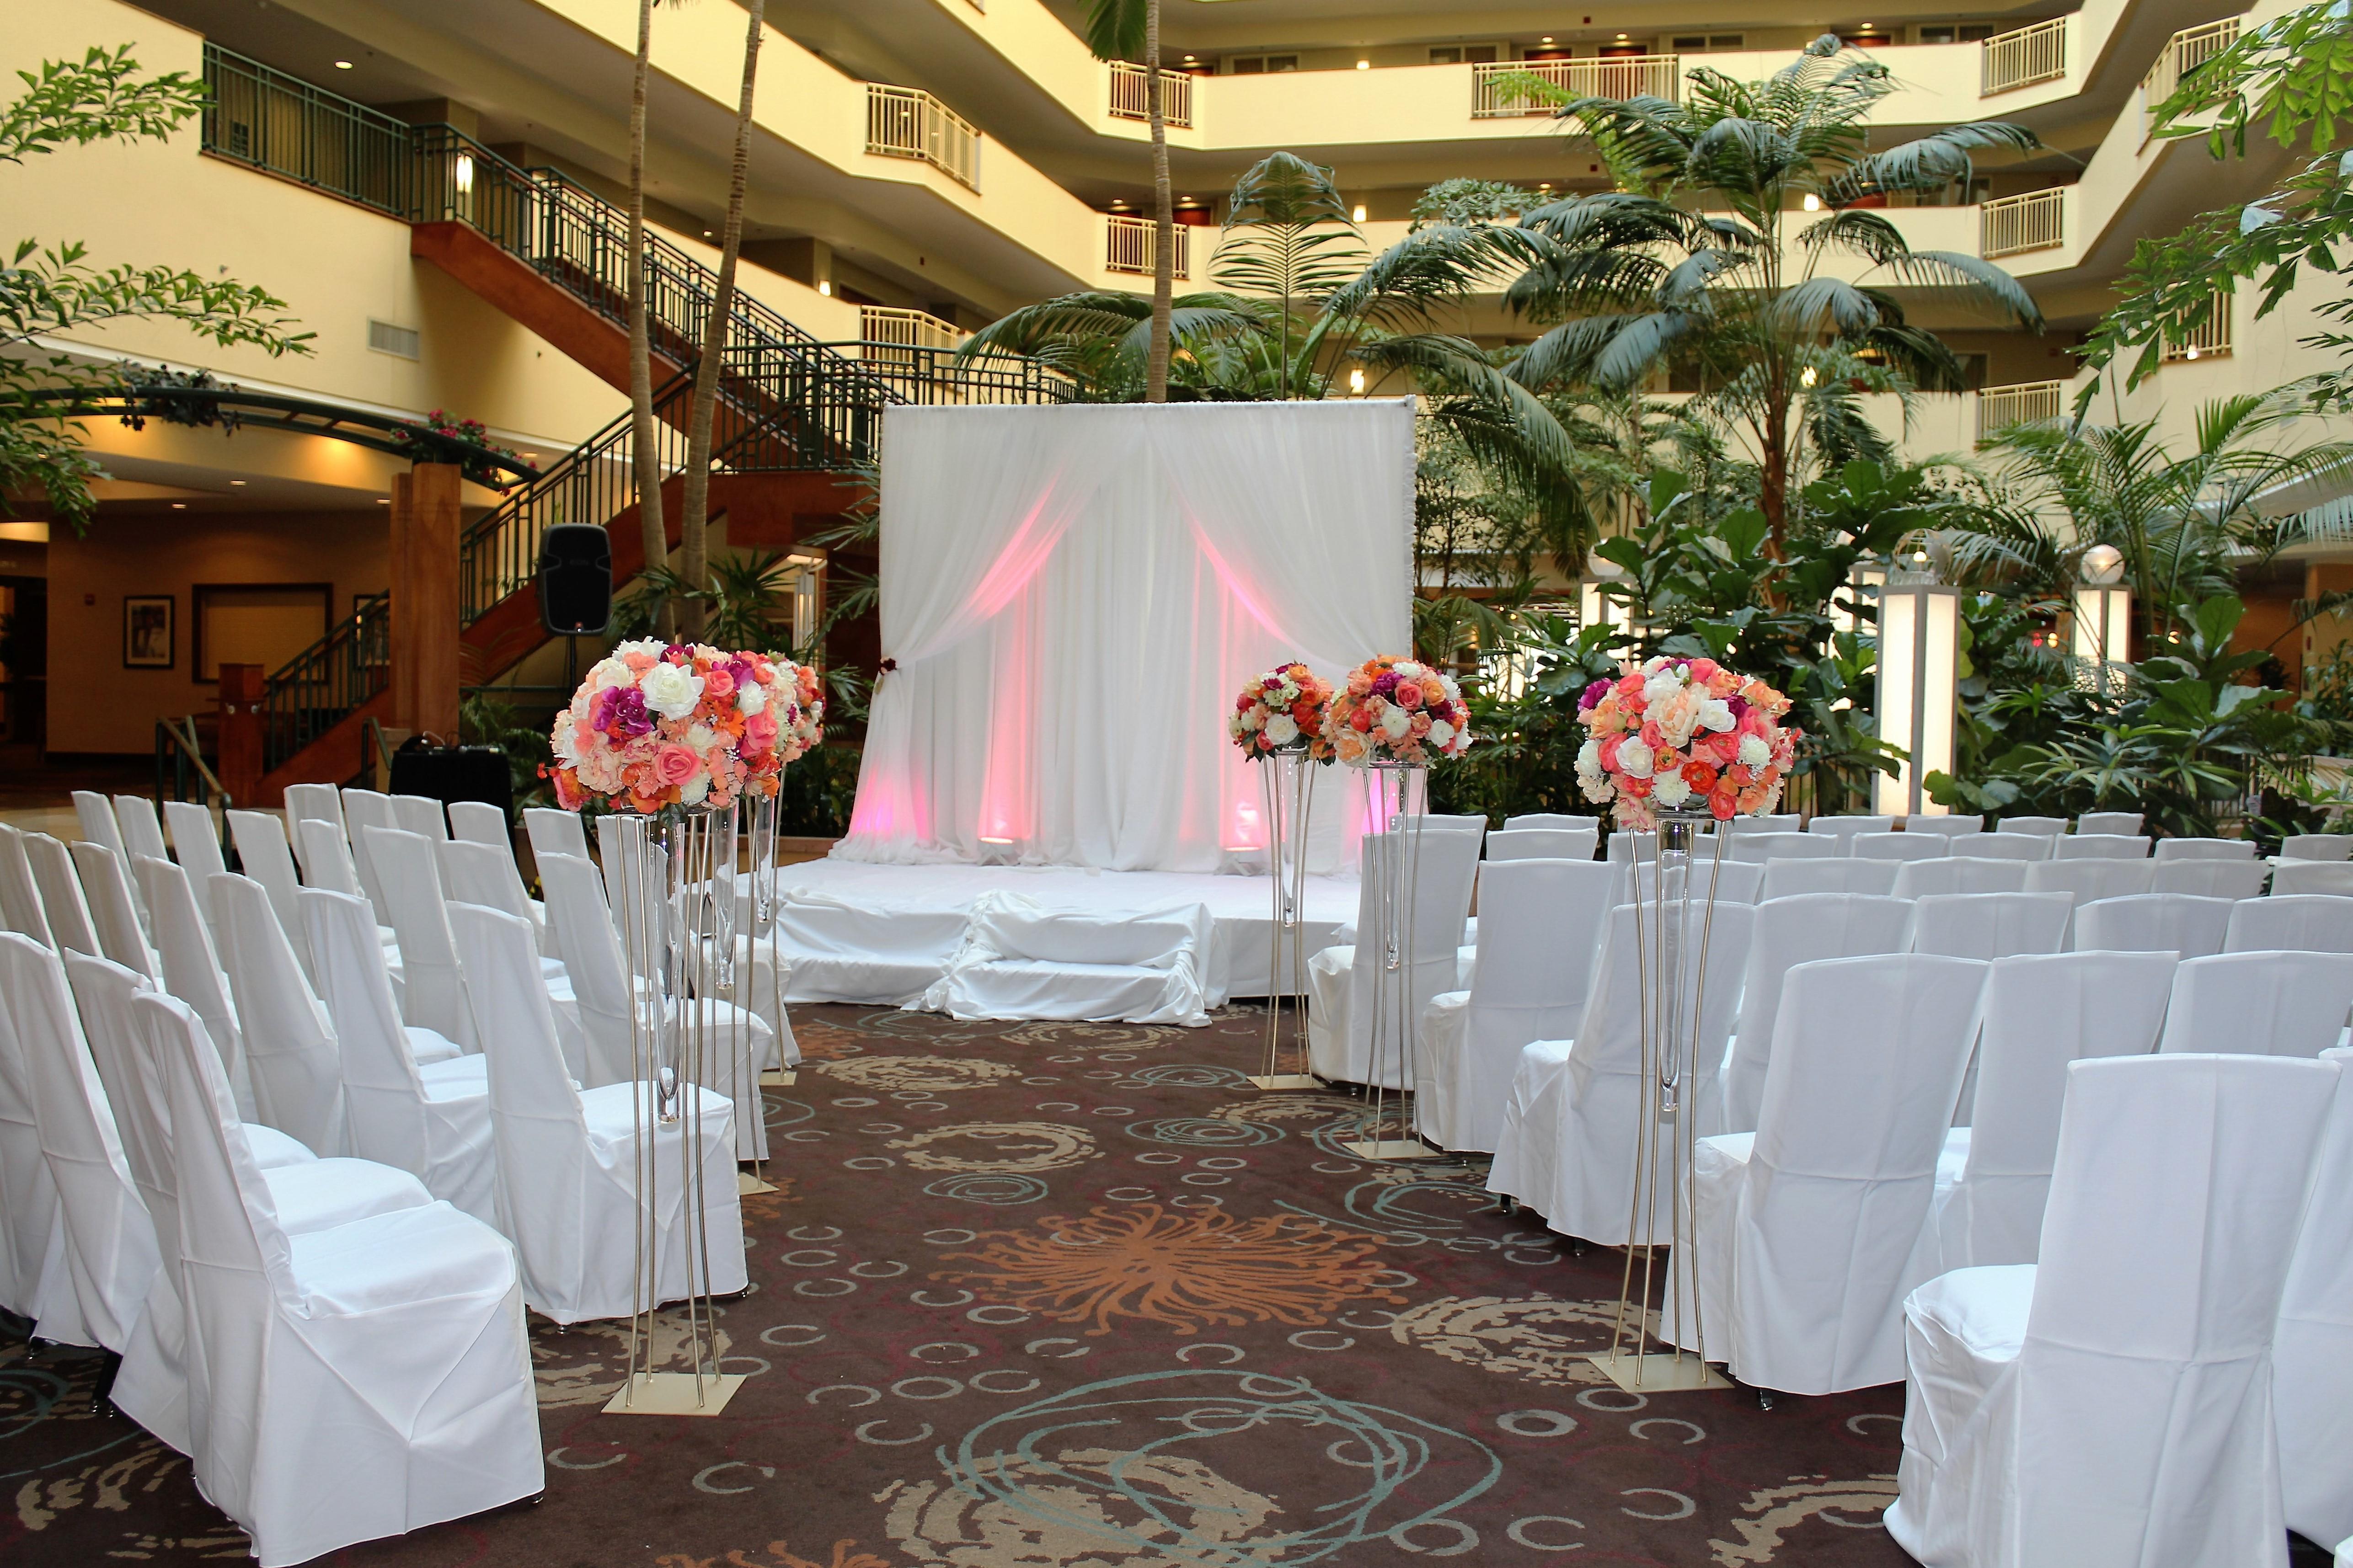 Weddings Ceremonies set up